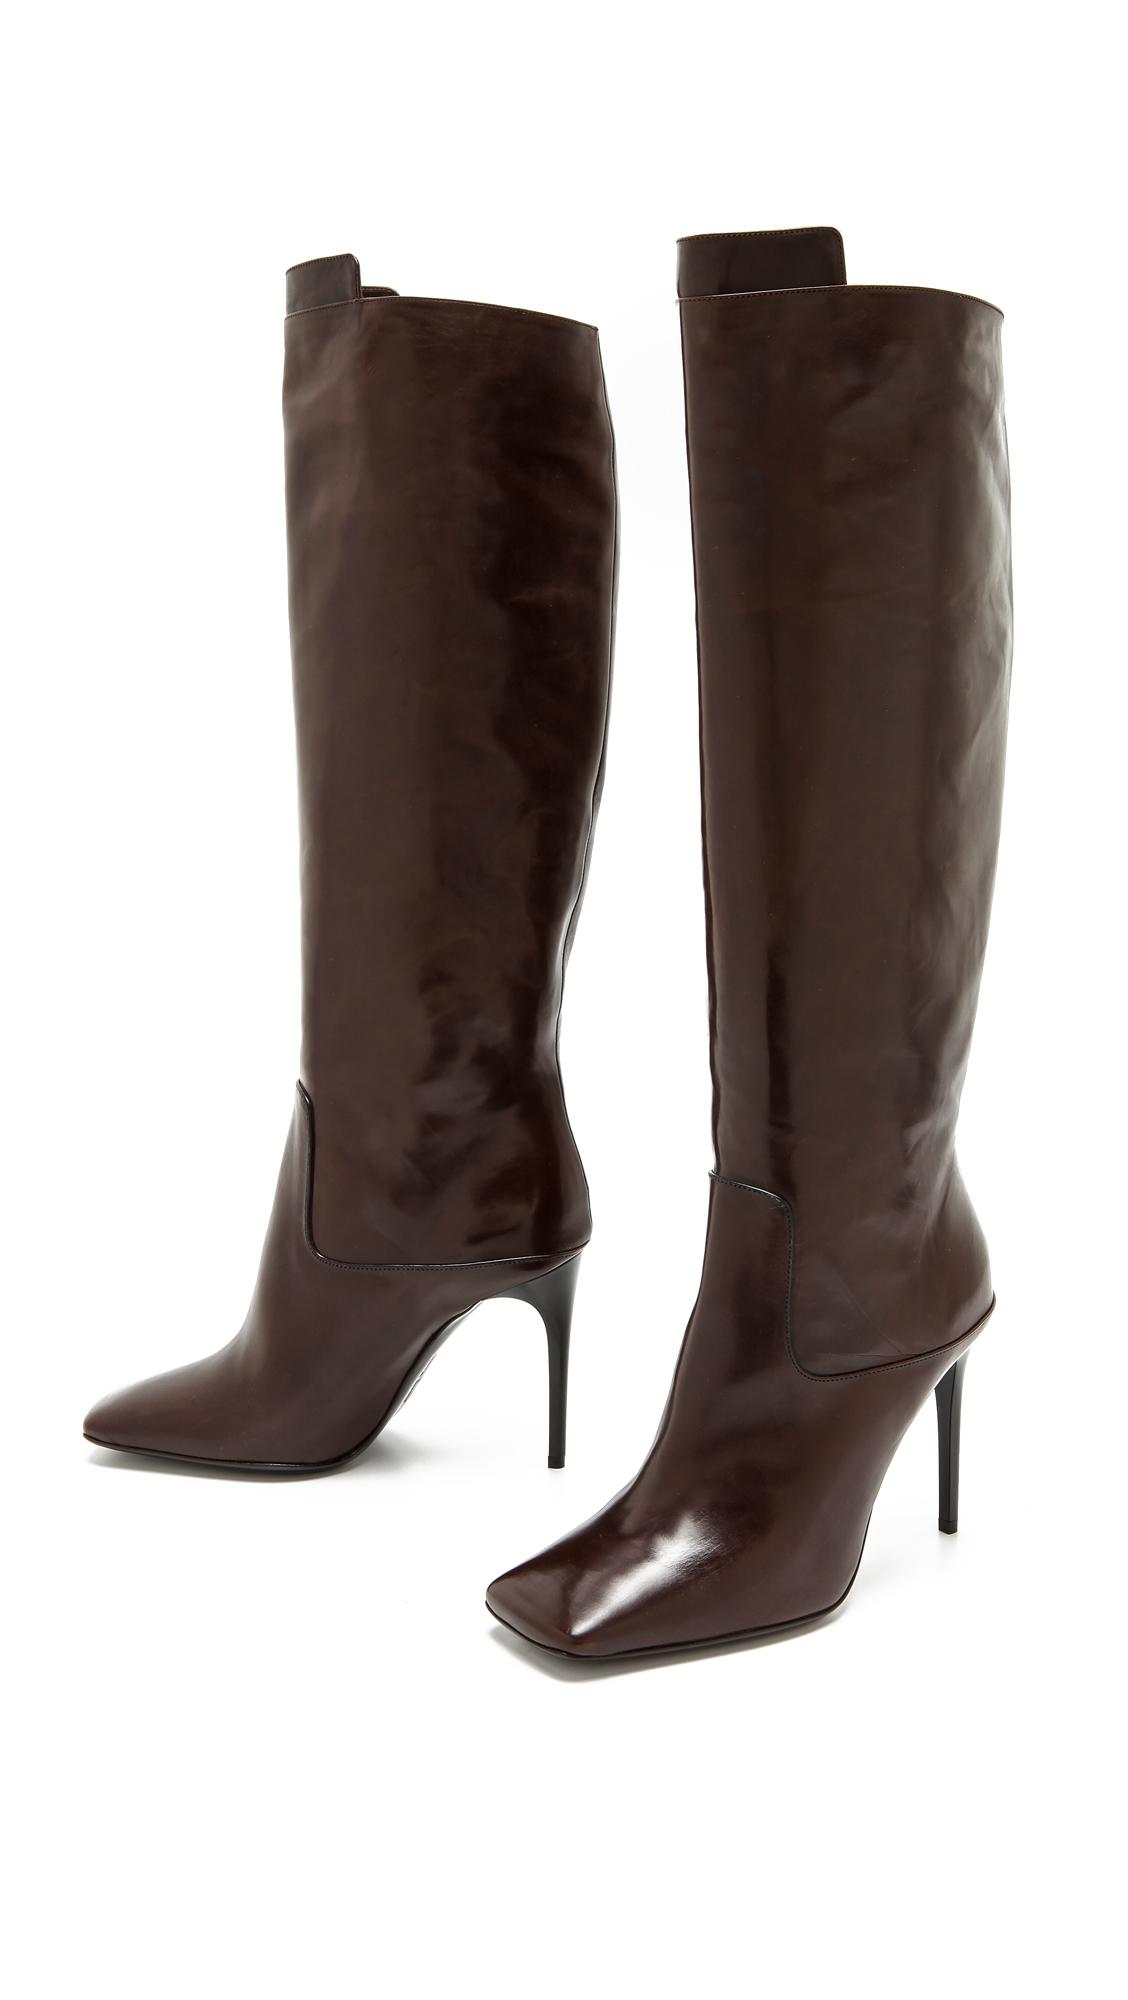 acne merial knee boots brown lyst